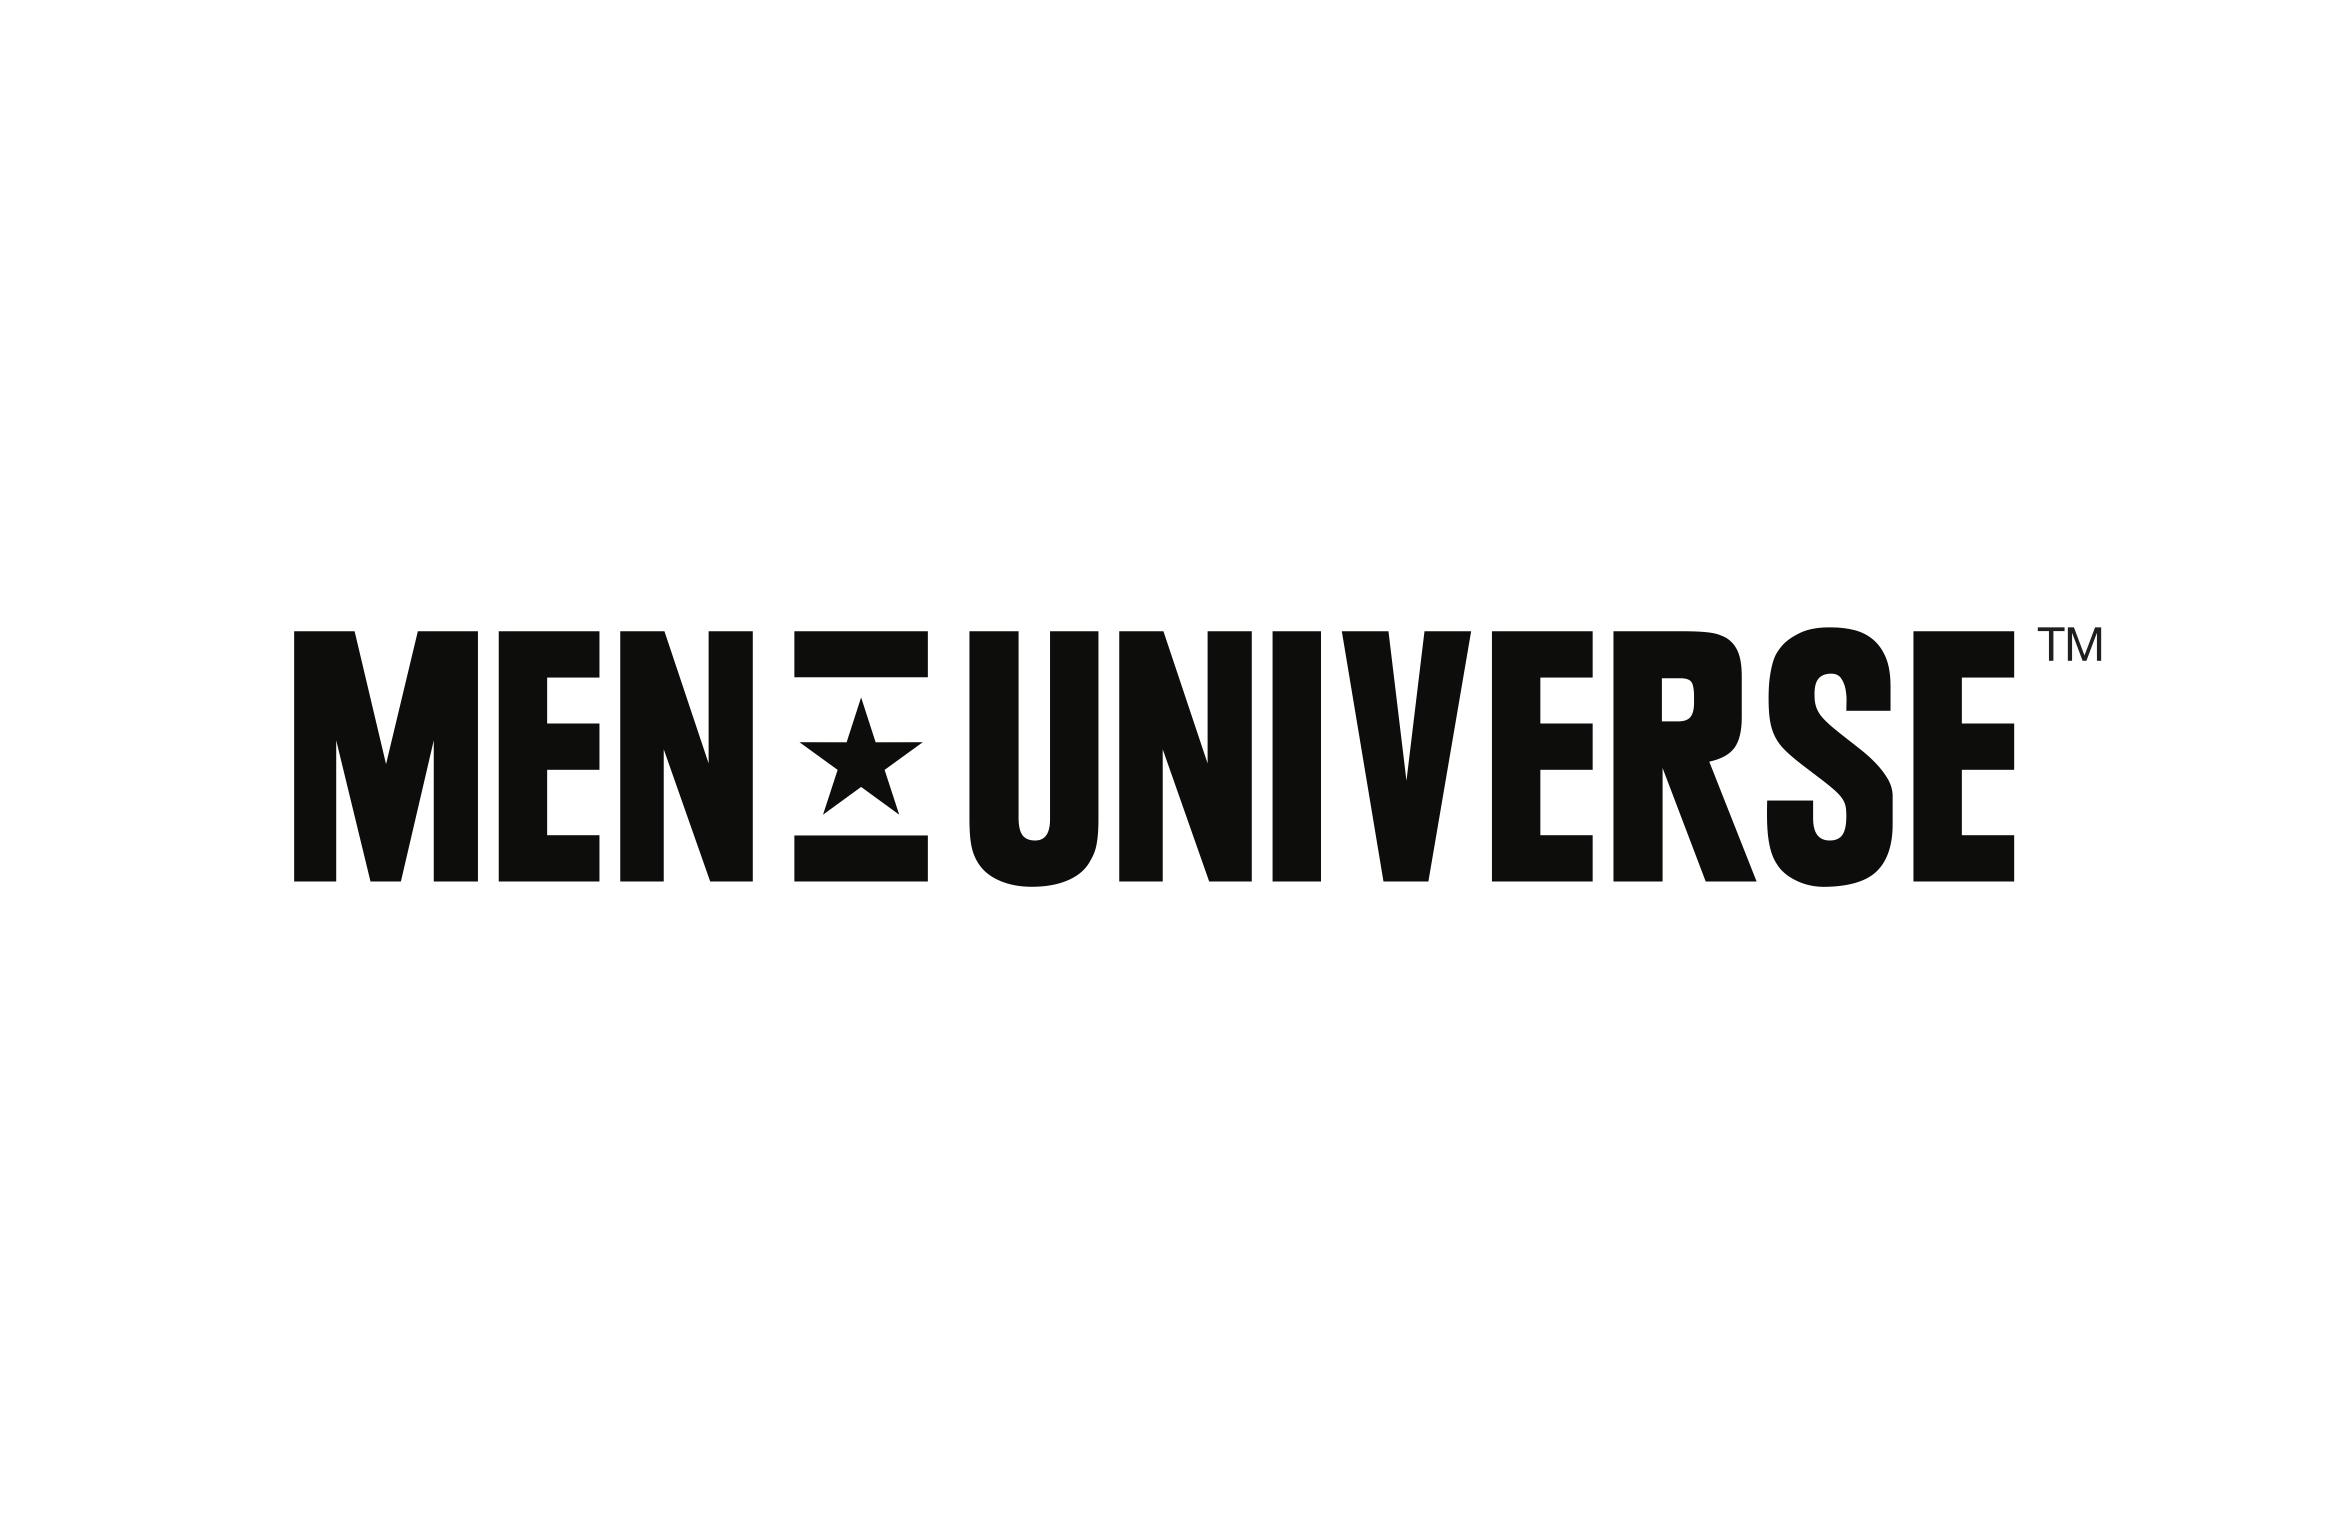 MEN UNIVERSE